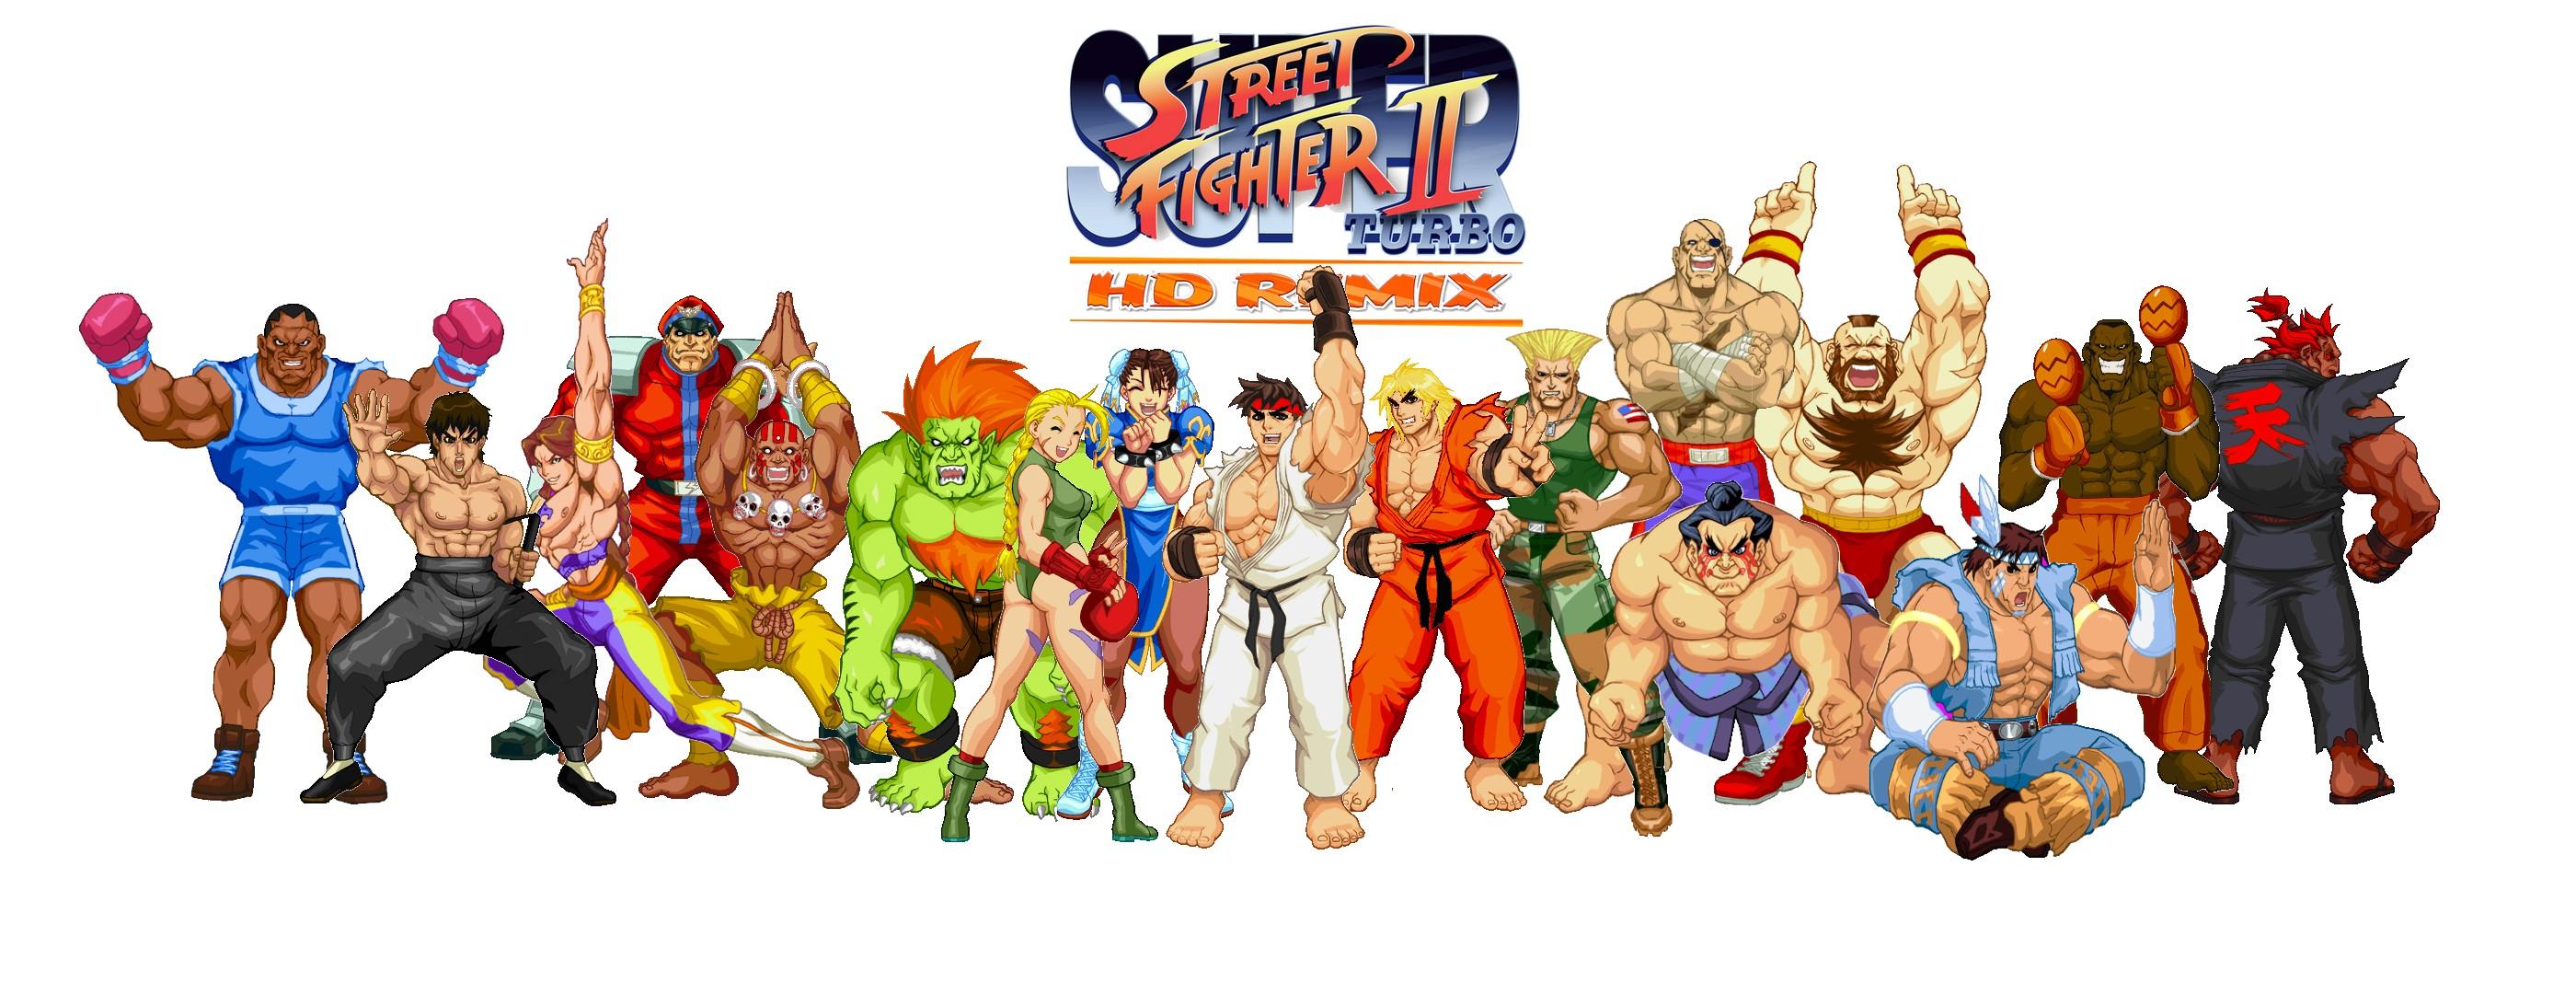 Super street fighter 2 turbo hd remix by juniorbunny on - Street fighter 2 wallpaper hd ...